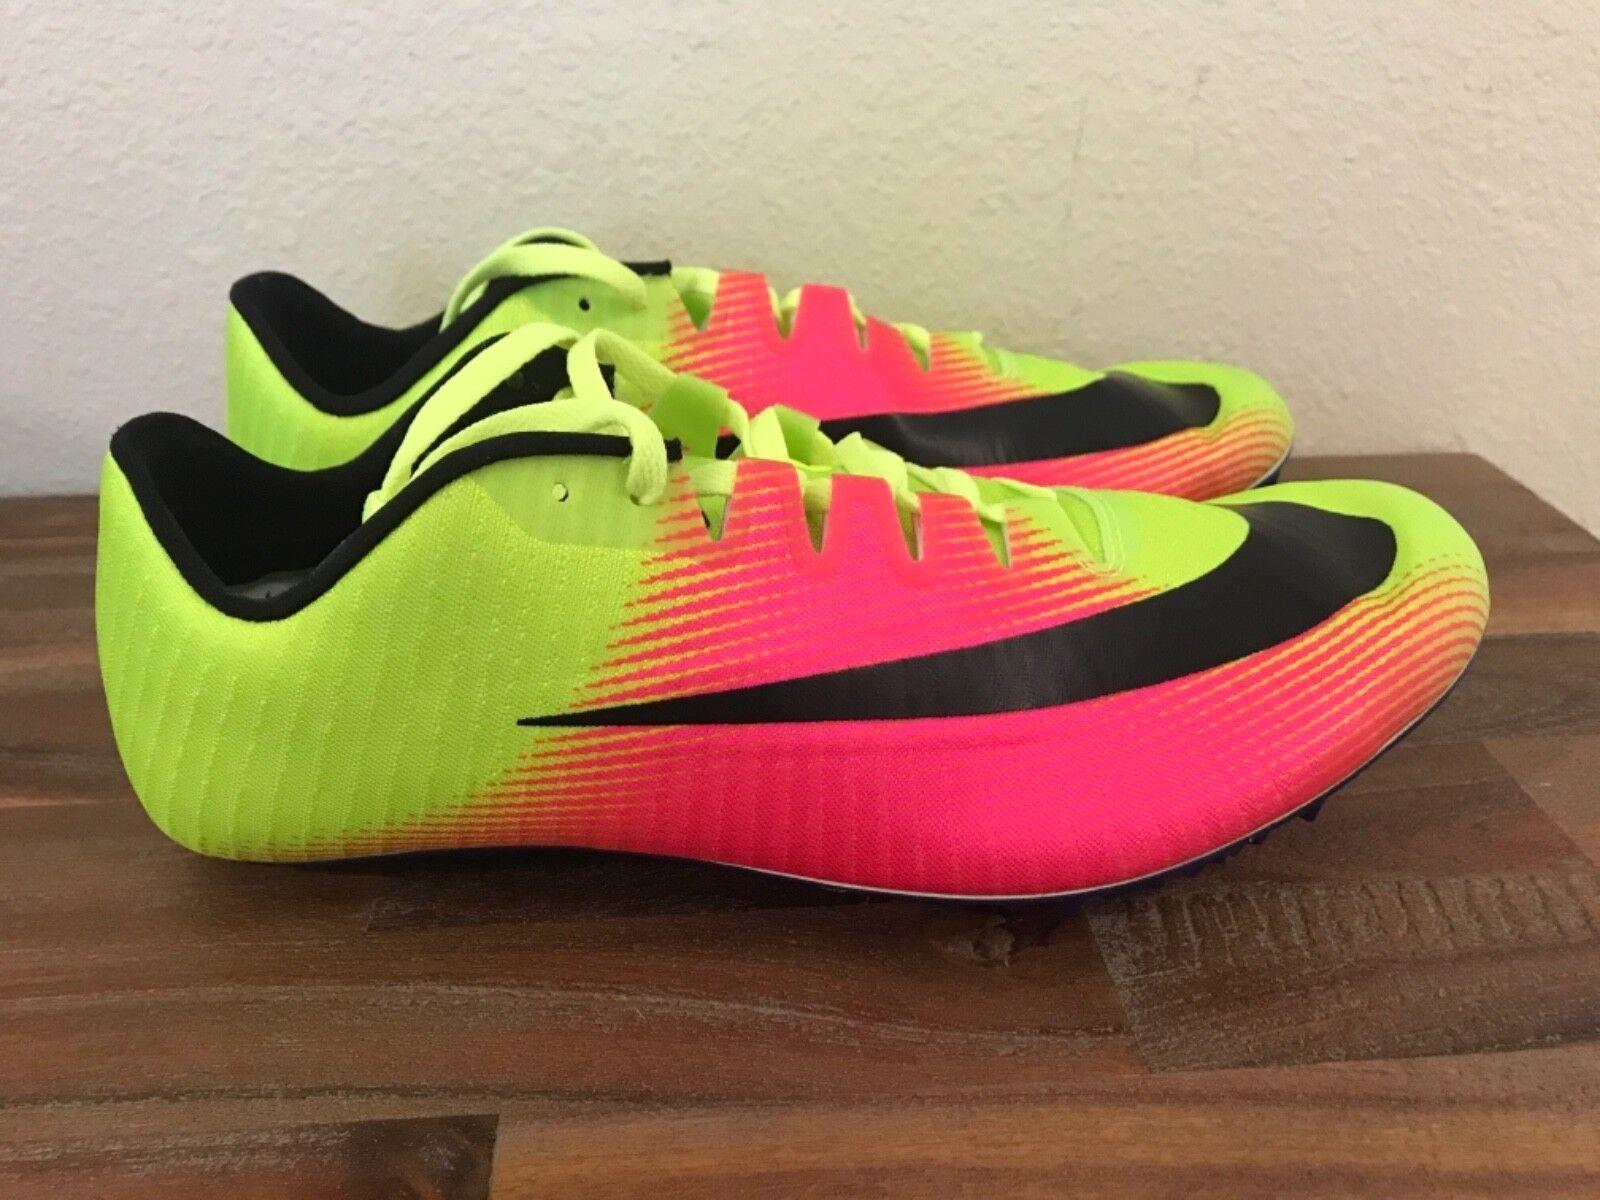 Nike Nike Nike Zoom JA FLY 3 OC Rio Track Field shoes Volt 882032-999 Men Sz 10.-11.5 16724d